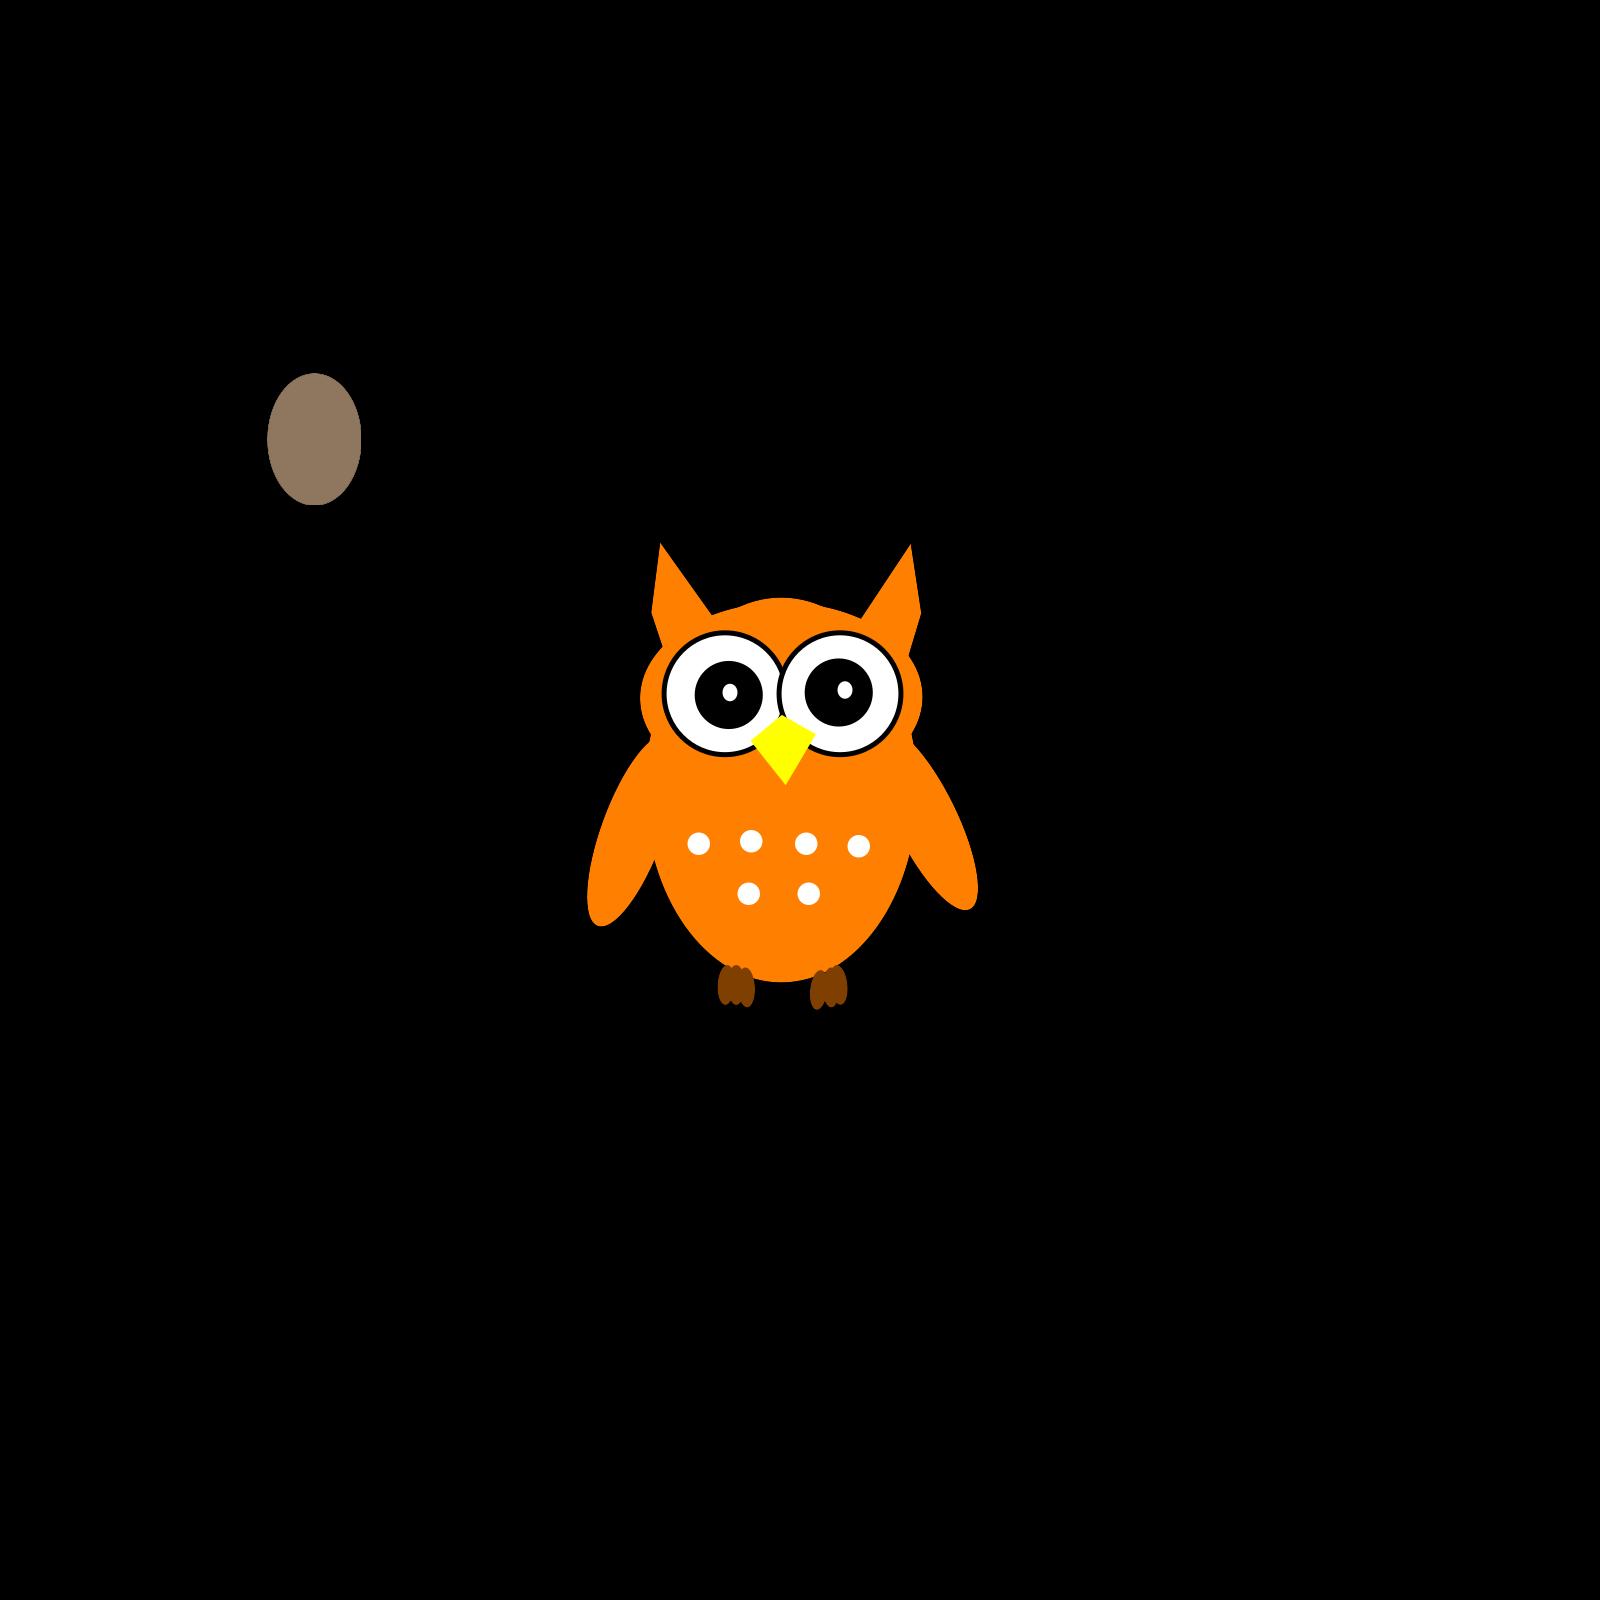 Orange Owl 2 SVG Vector, Orange Owl 2 Clip art - SVG Clipart